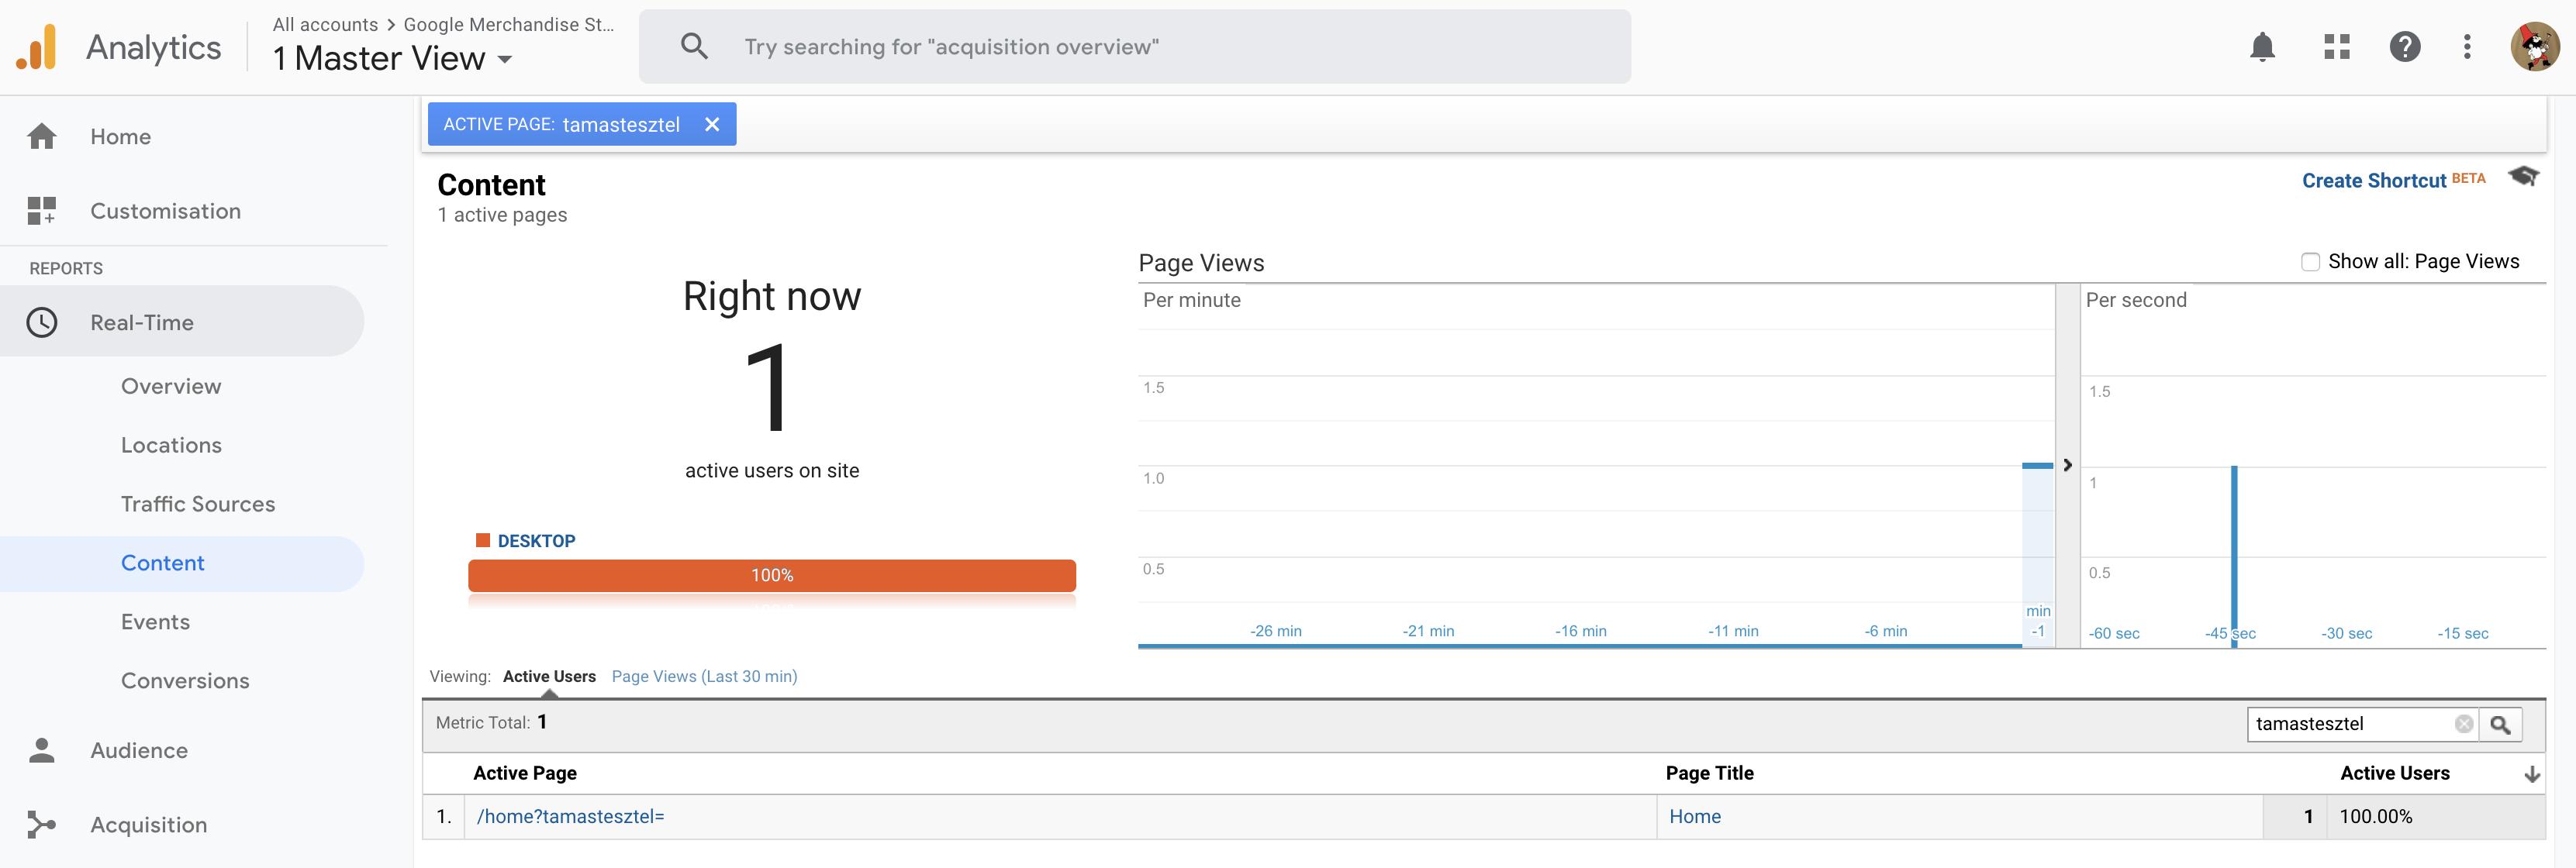 1 abra - real time-Google Analytics